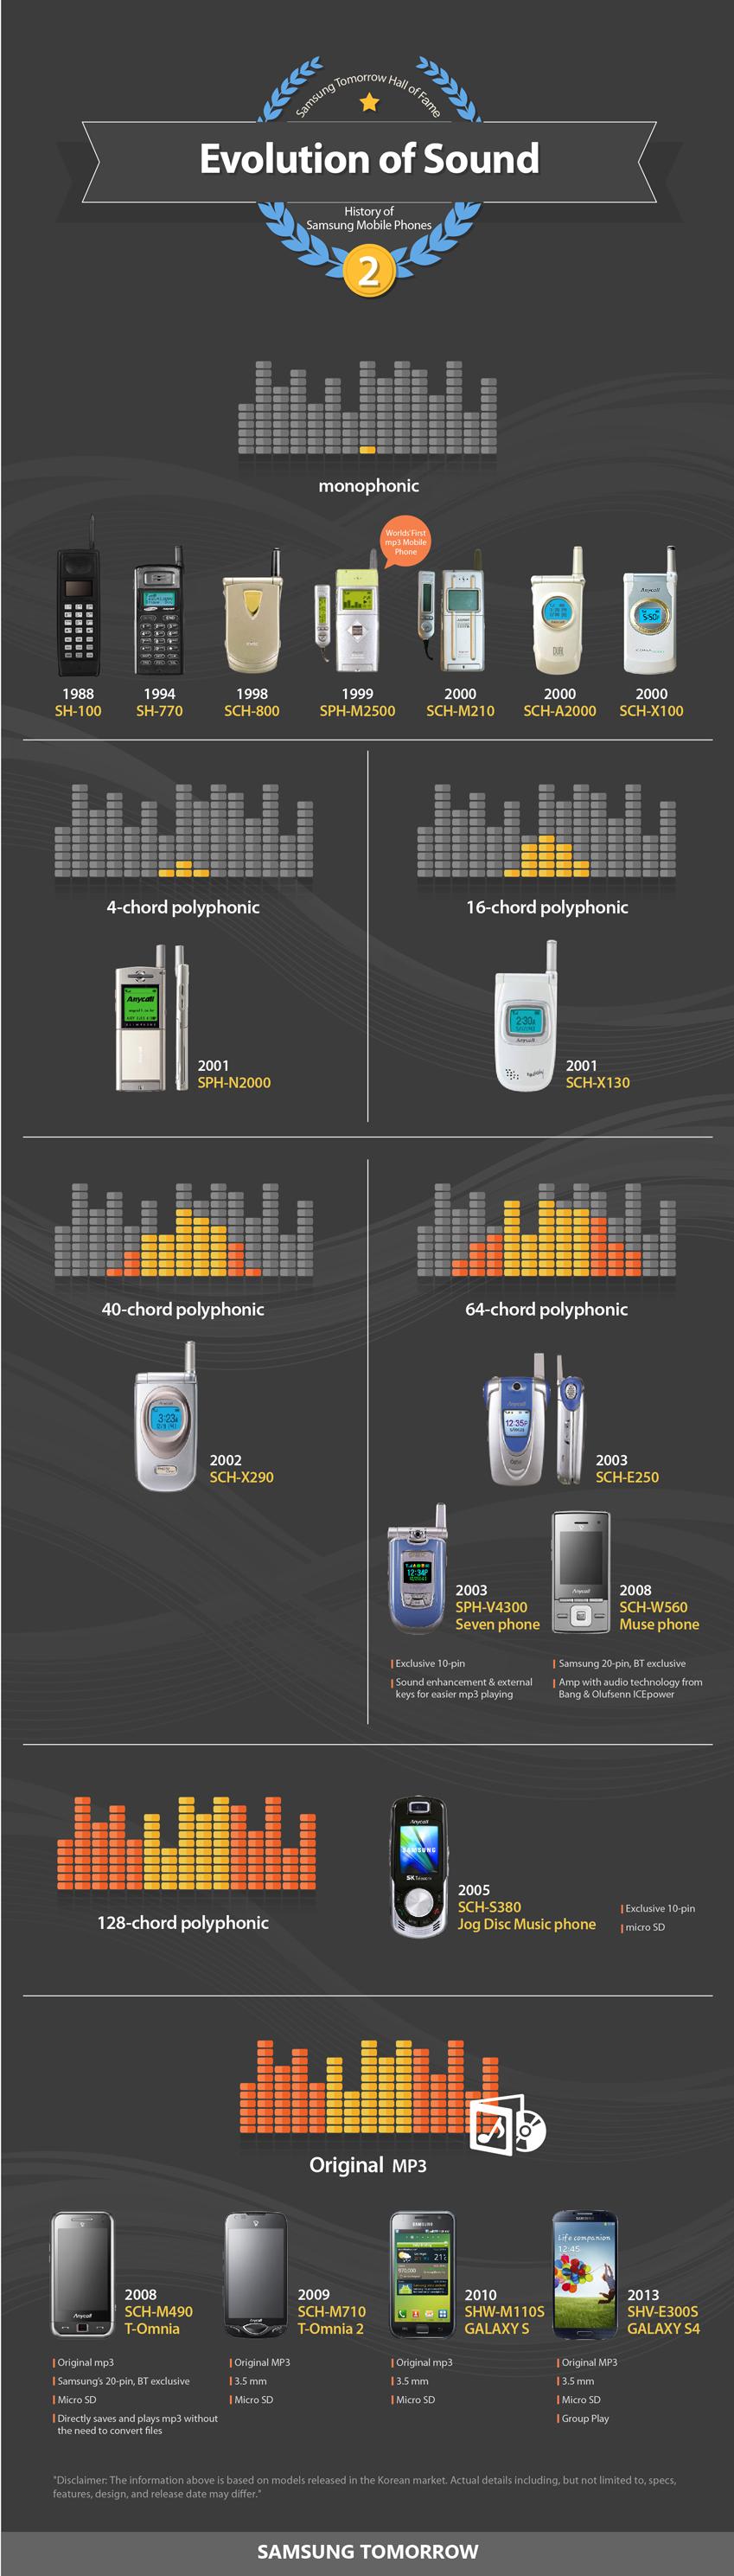 History of Samsung Mobile Phones: Evolution of Sound